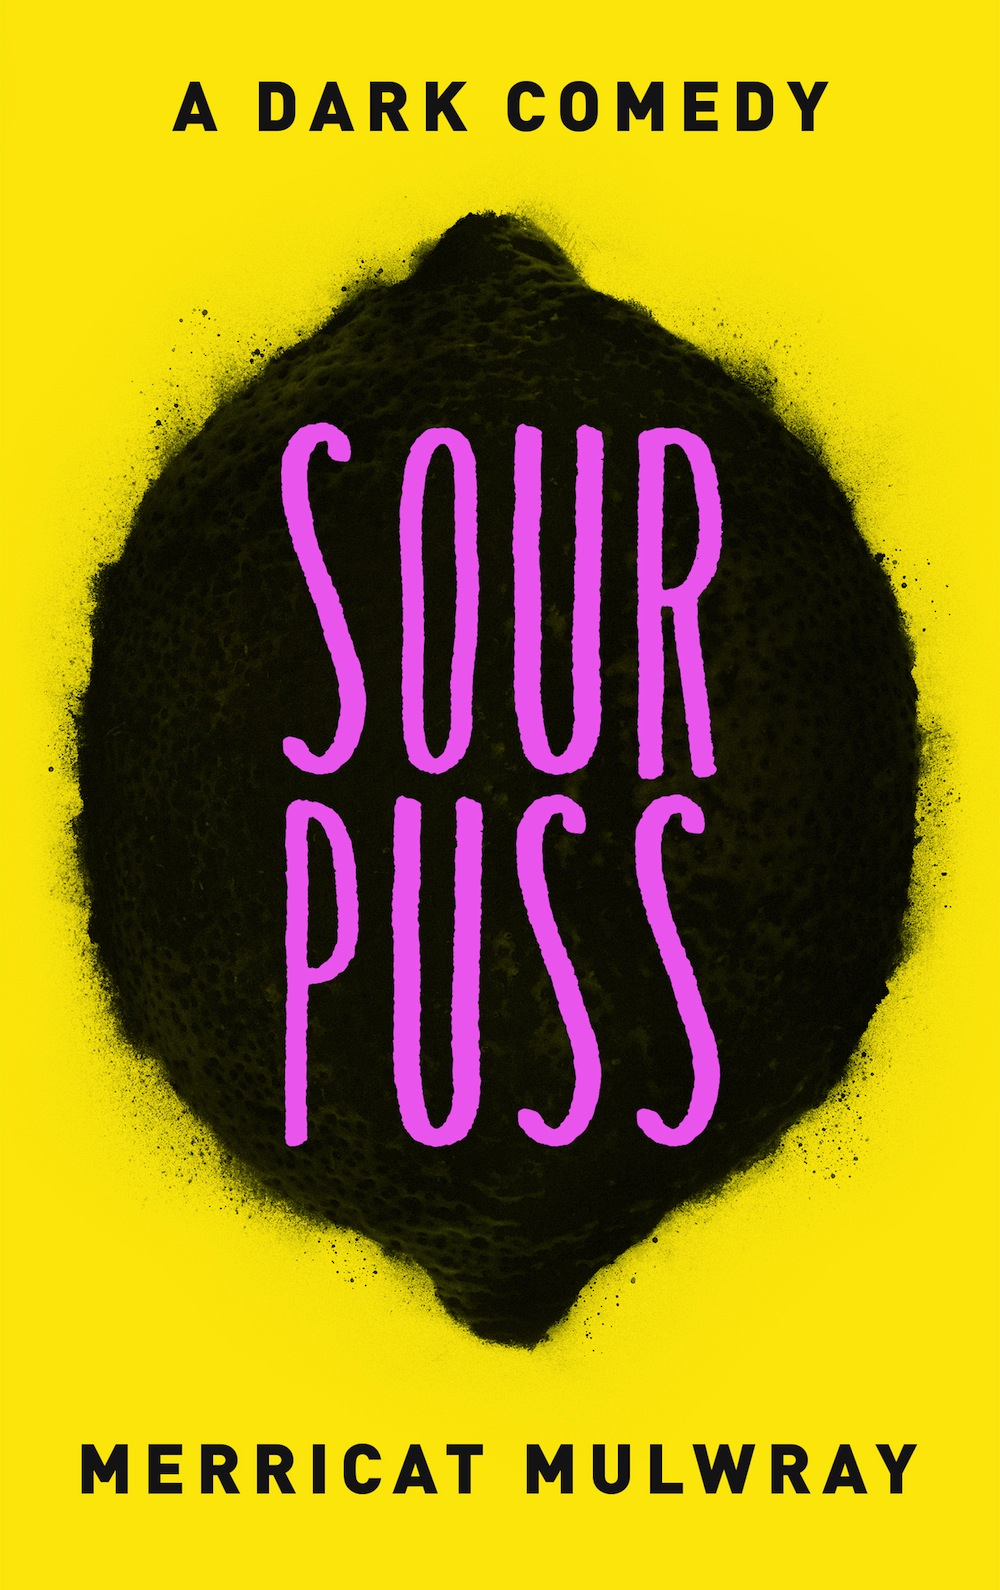 sourpuss_5x8_front